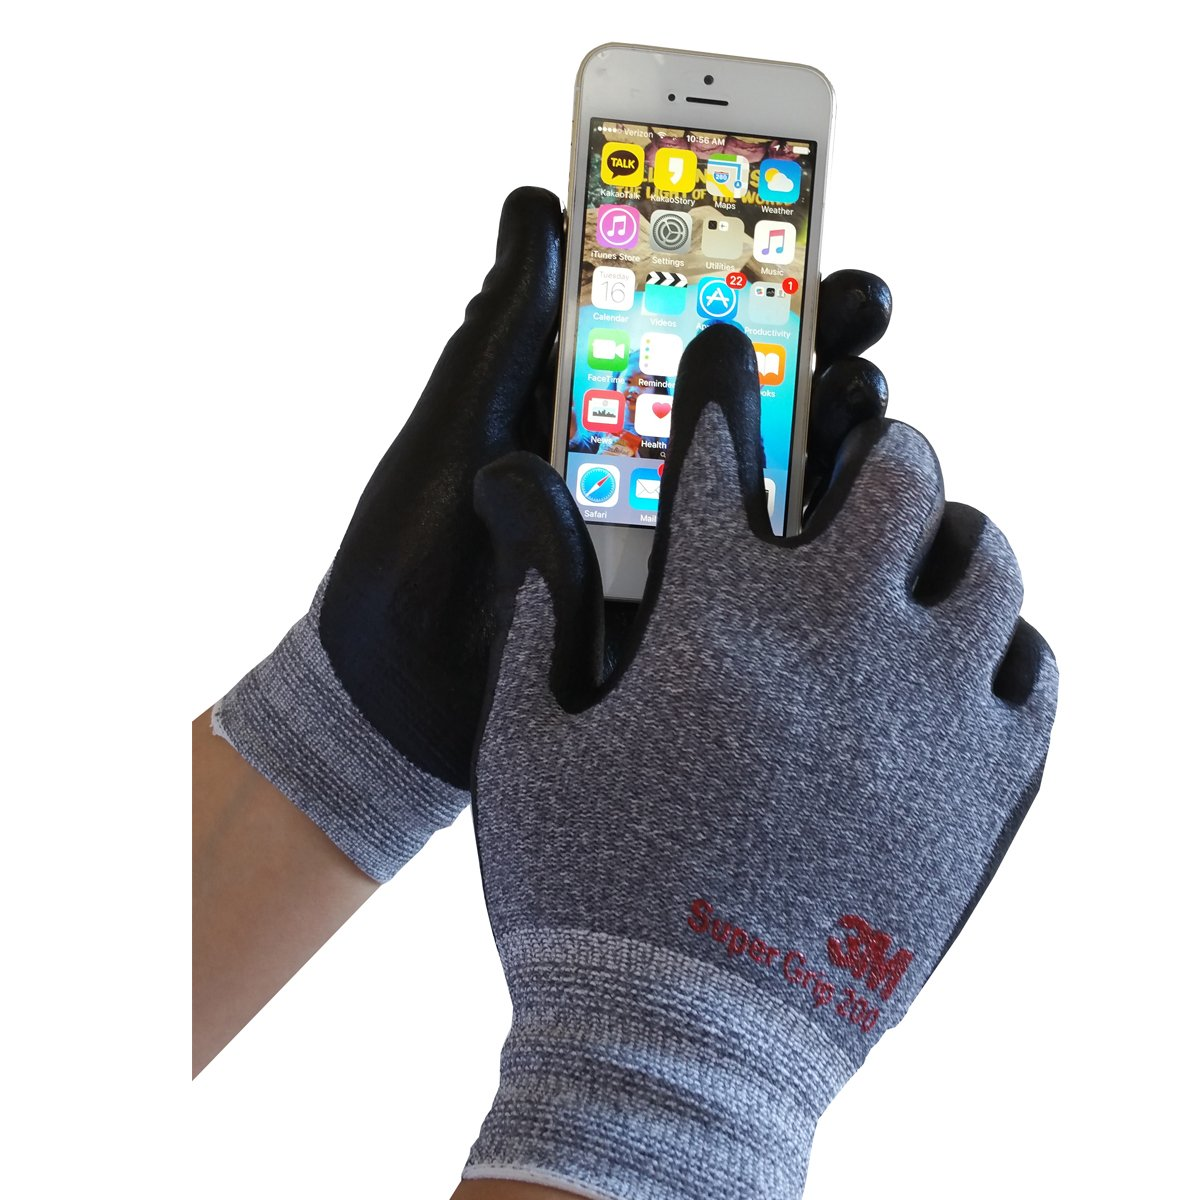 3M Super Grip Garden Work Gloves- 3 PACK (Extra Large) by 3M Super Grip (Image #5)